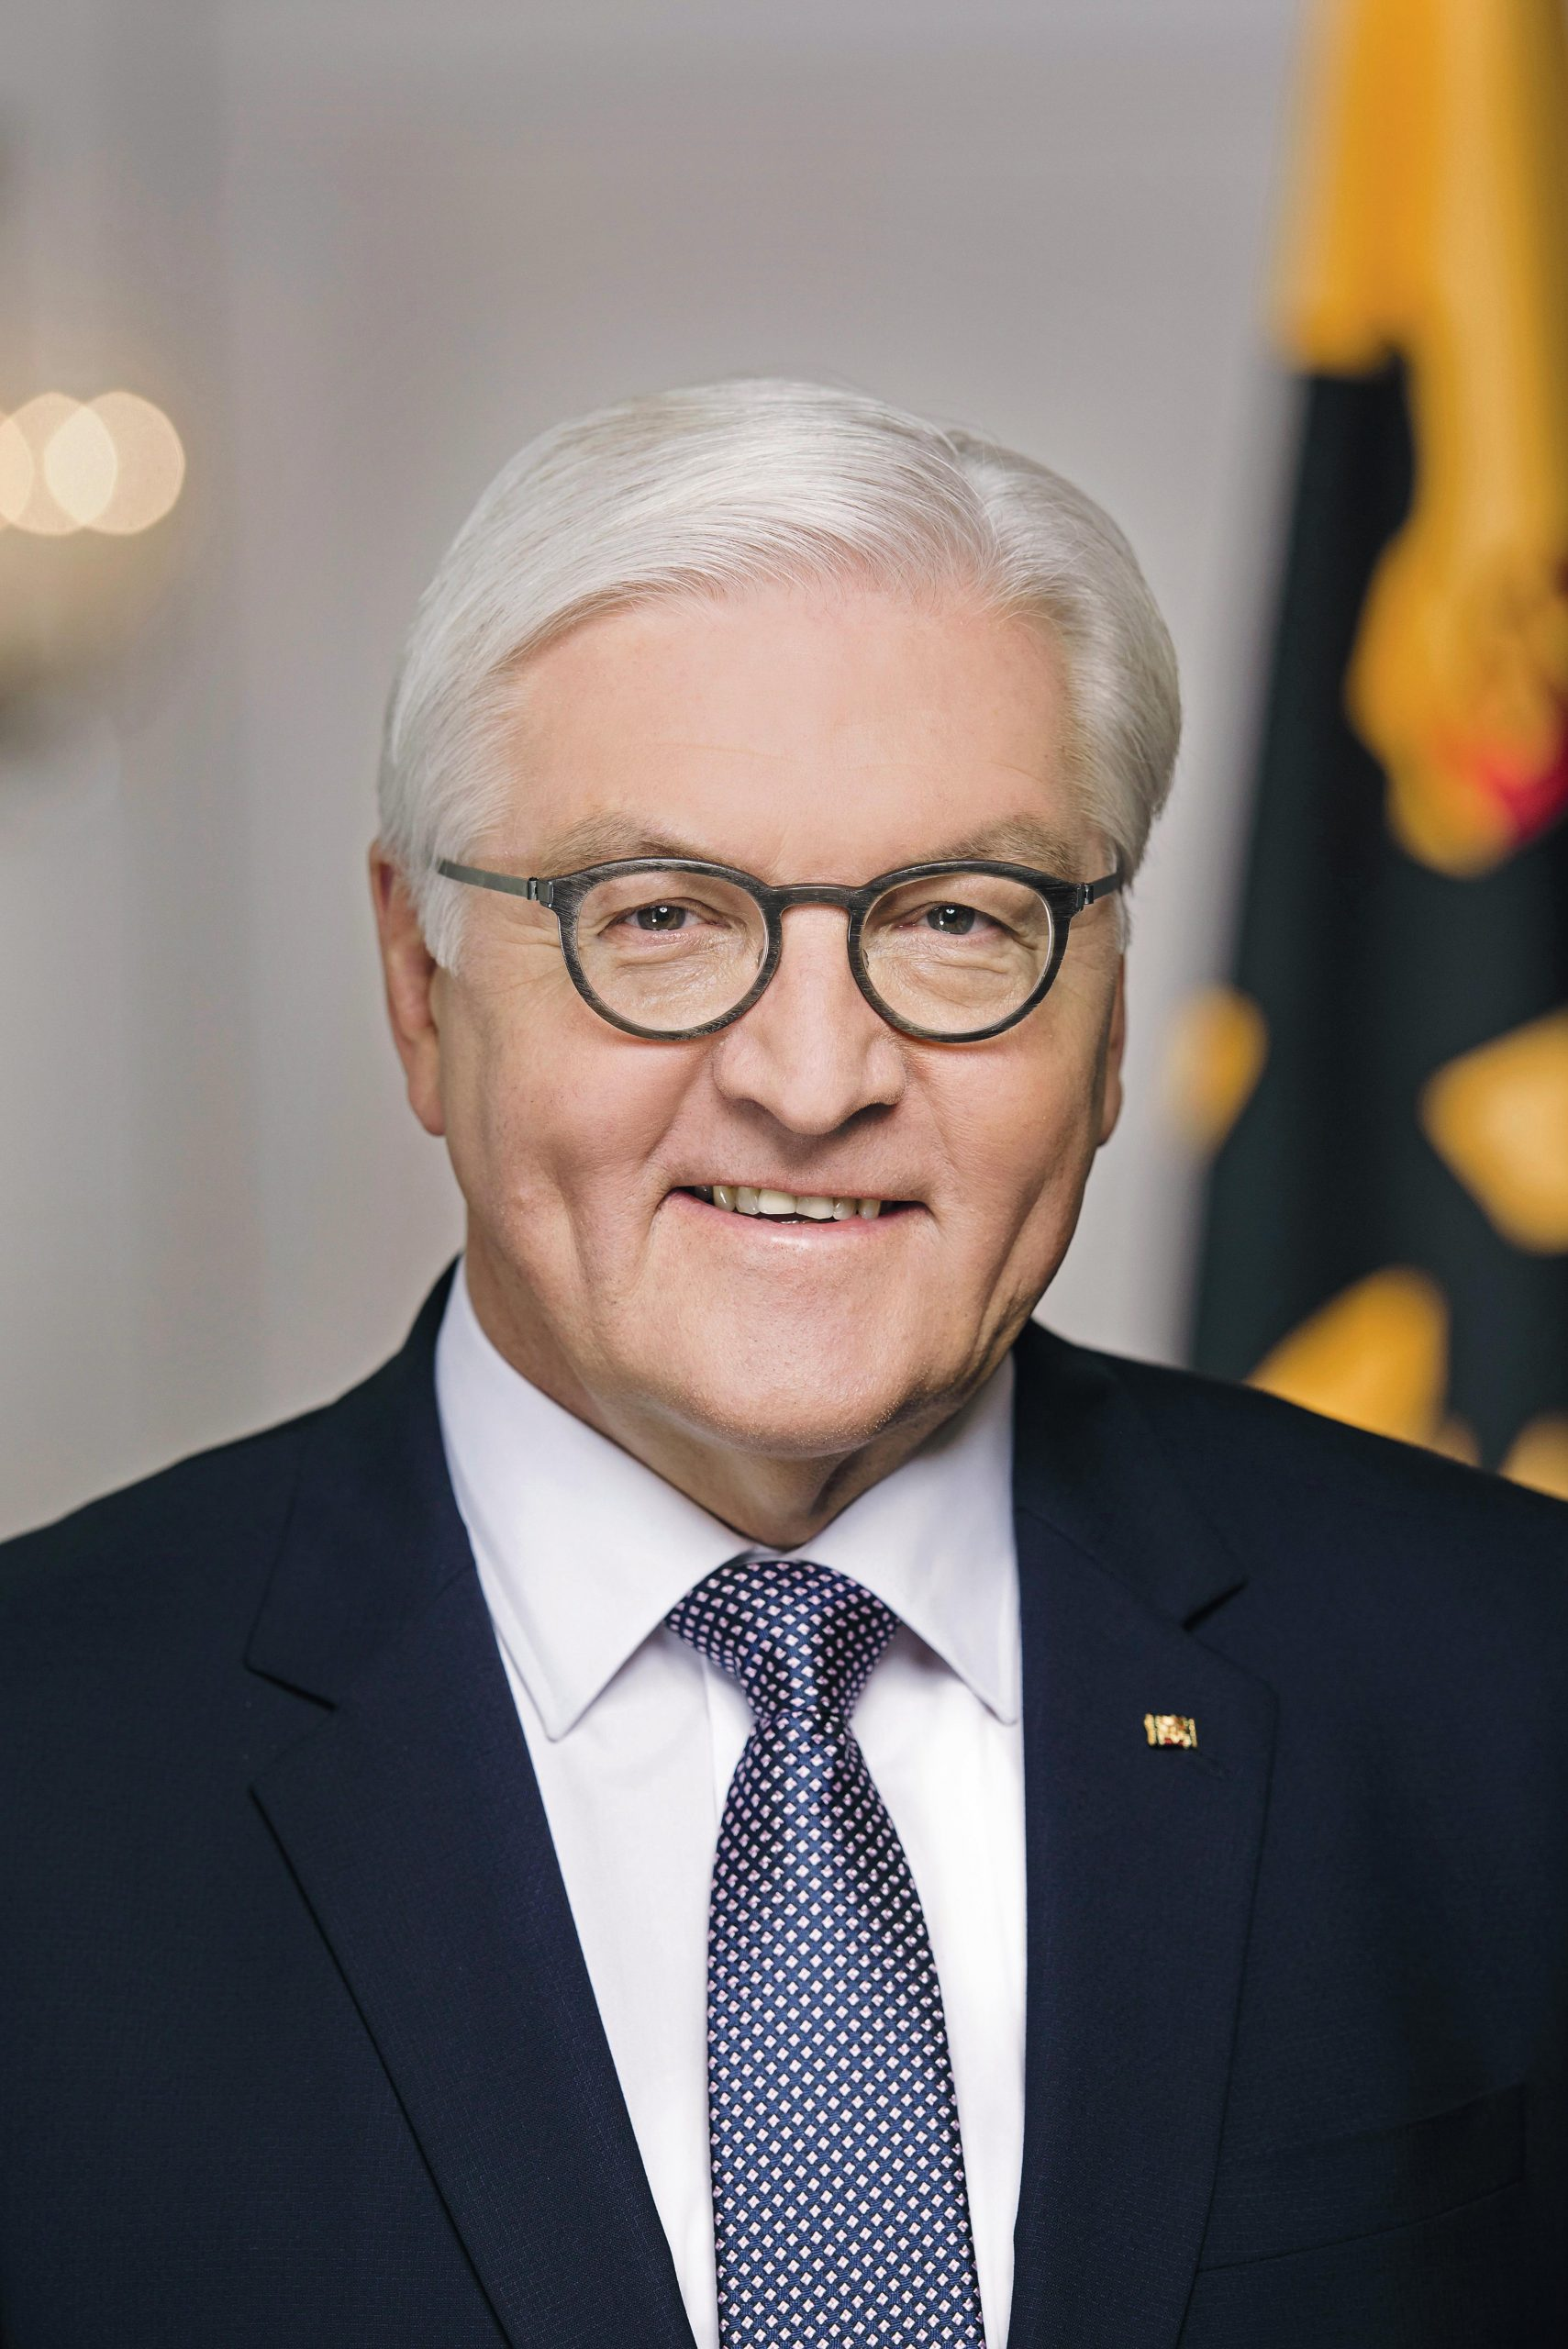 Bundespräsident gratuliert Frank Zander